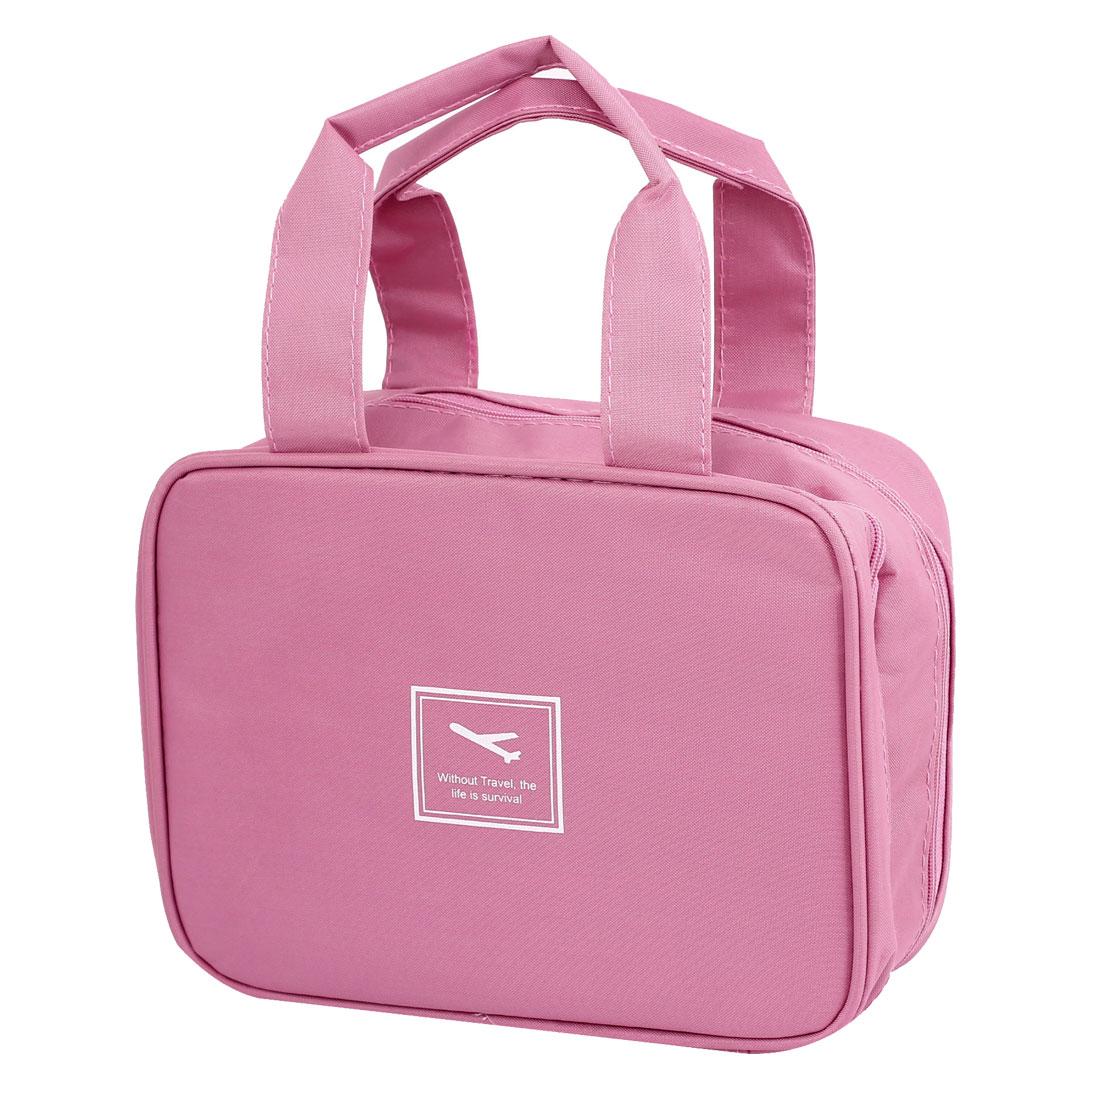 Outdoor Travel Toiletry Toiletries Cosmetic Beauty Wash Bag Handbag Pink